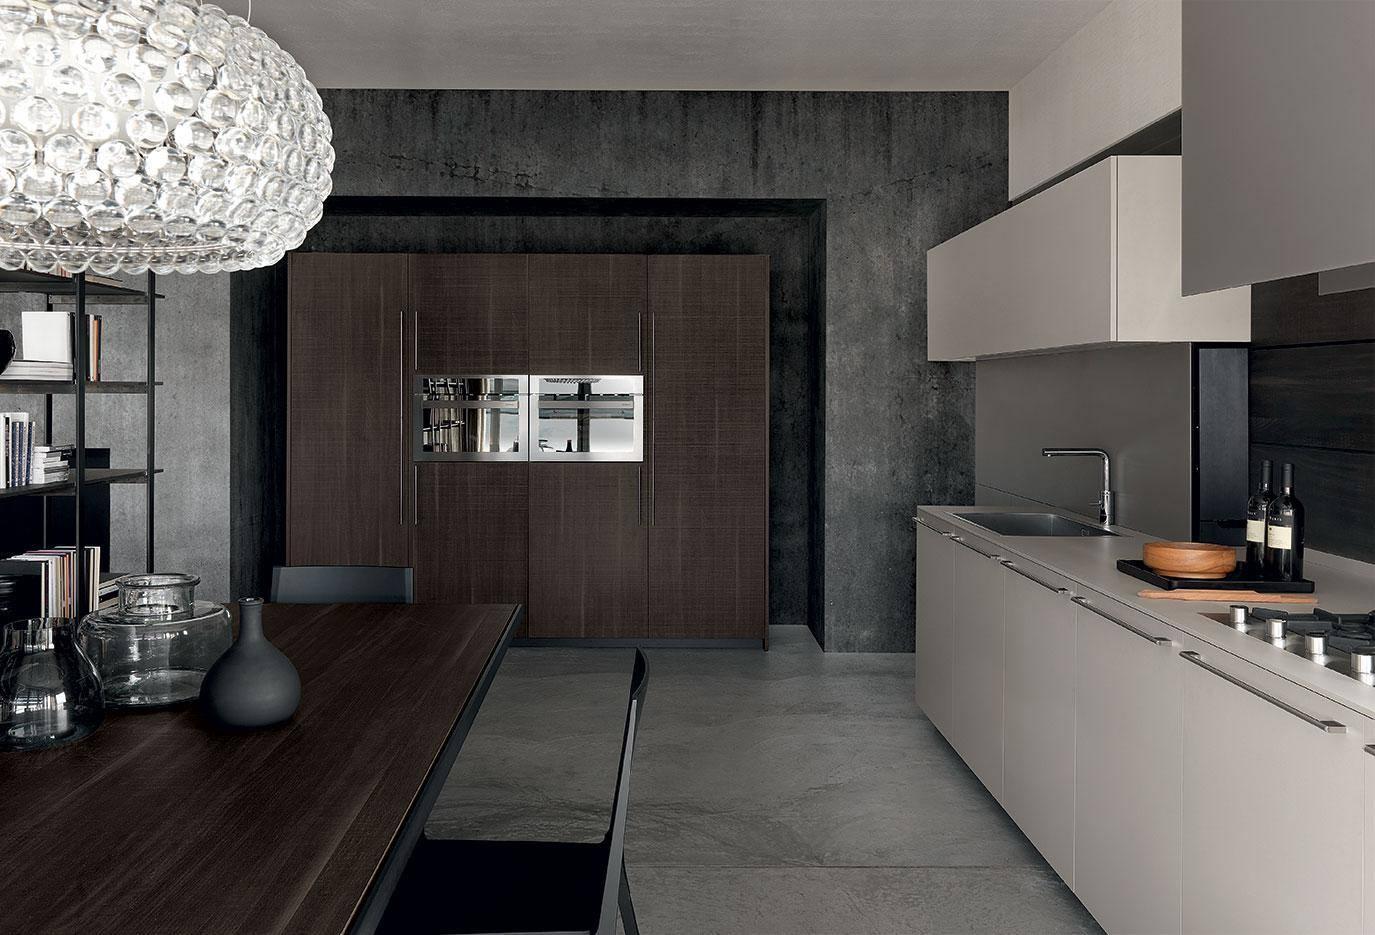 Novit cucine modulnova ballarini interni ballarini - Cucine 2017 moderne ...